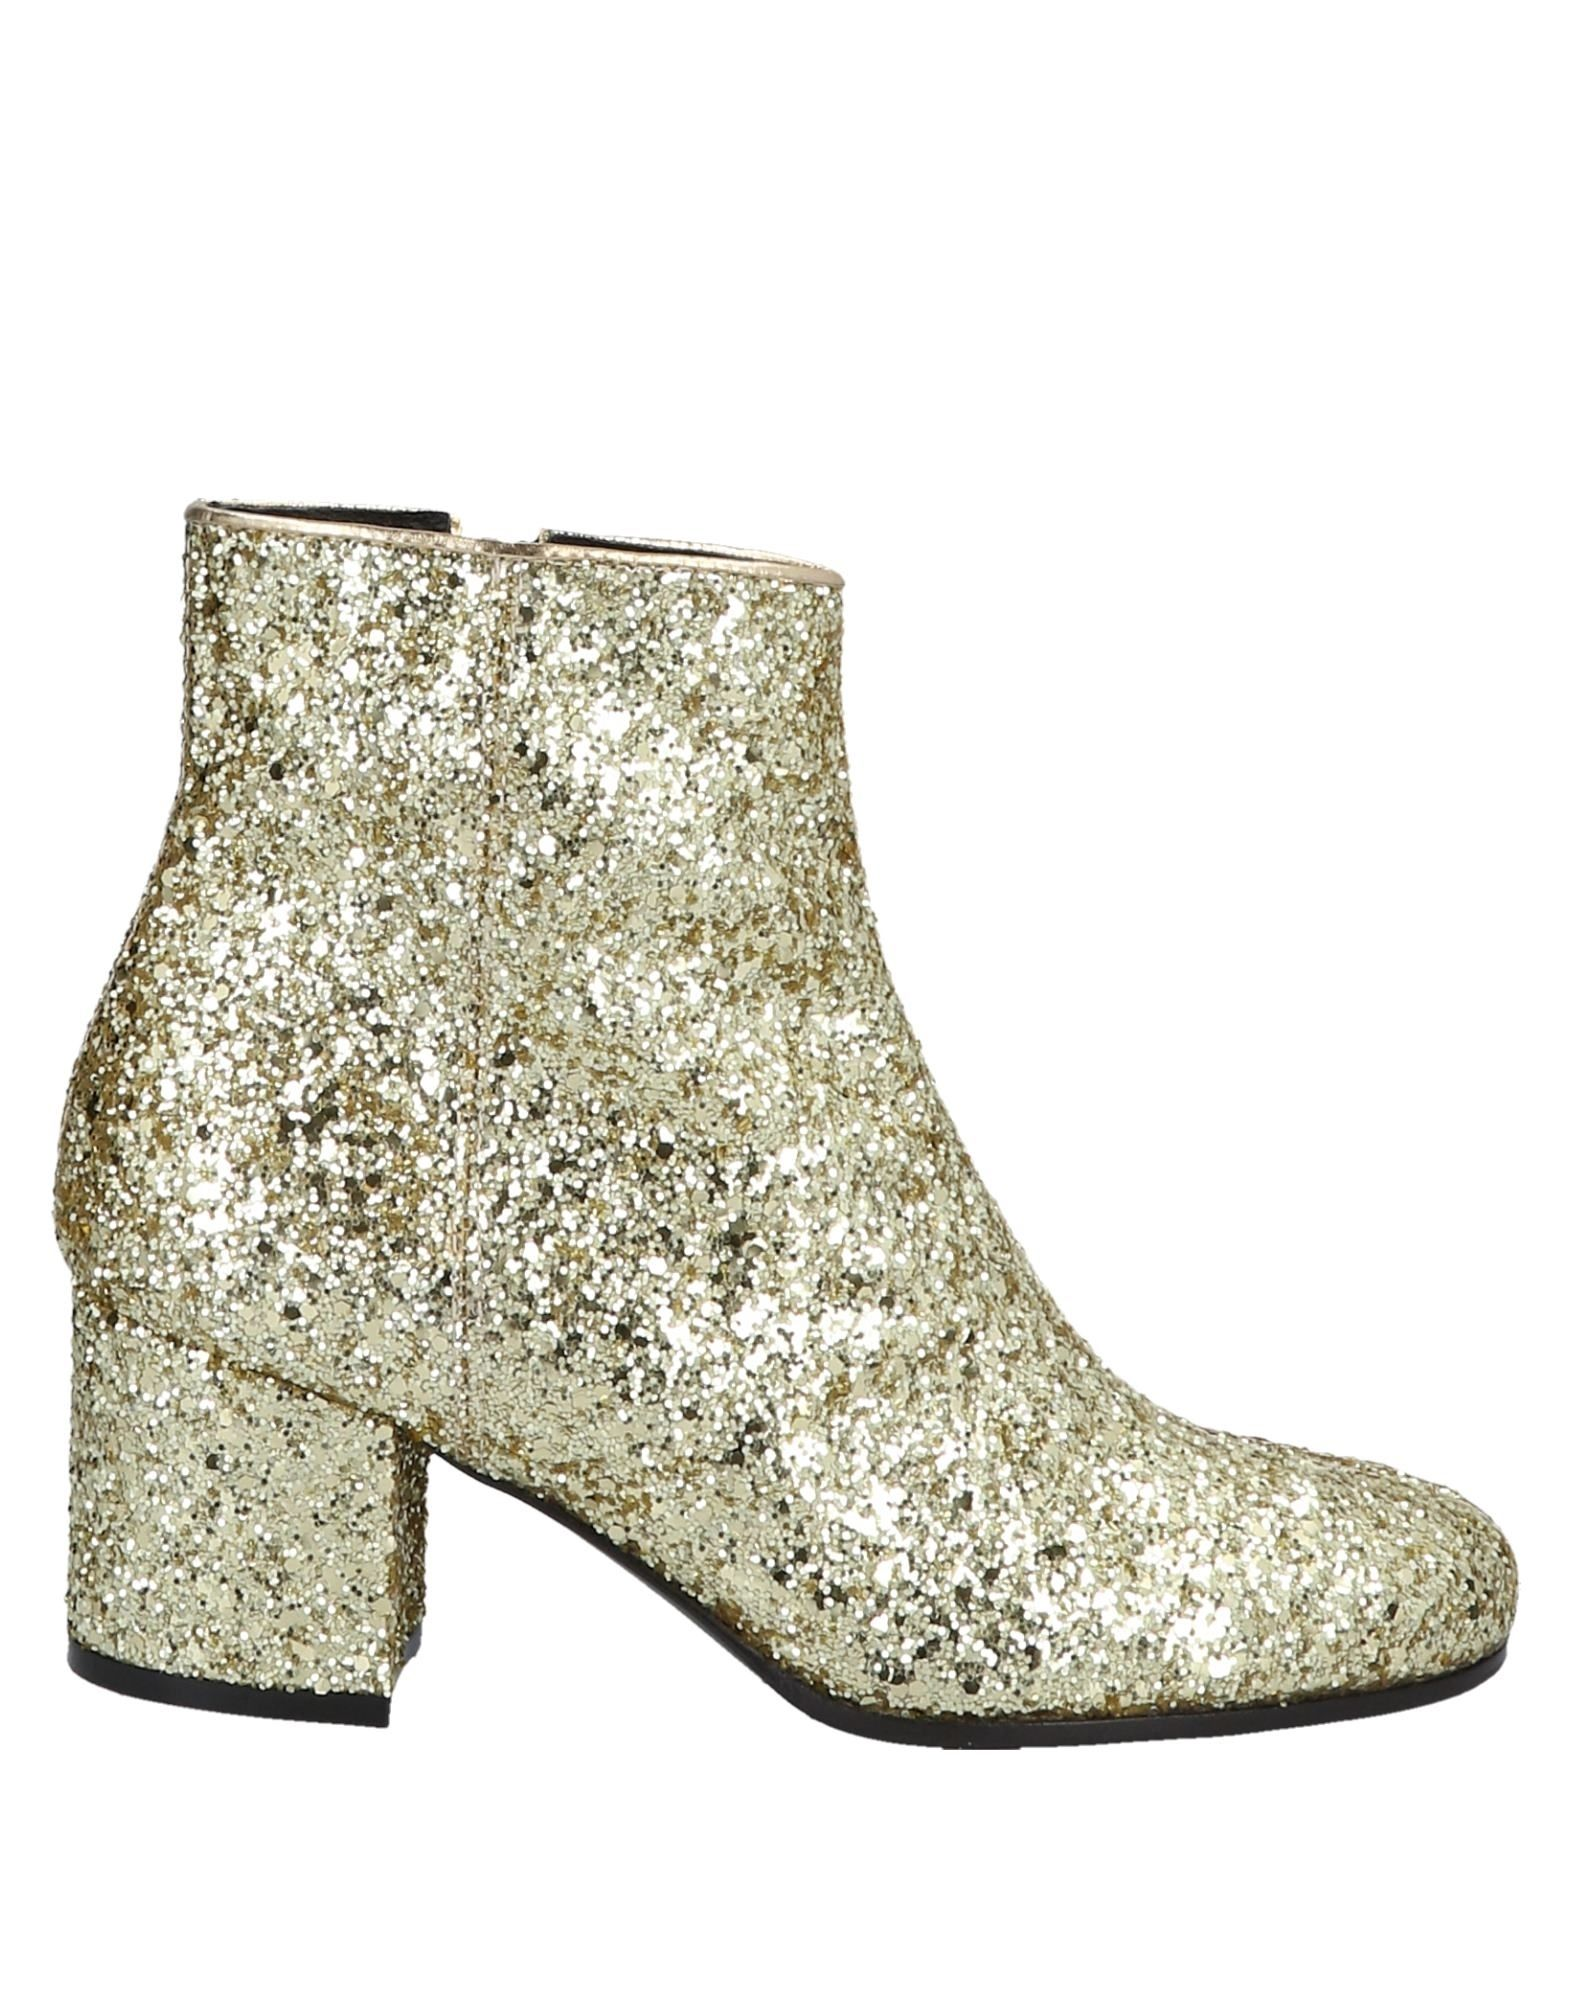 Via Roma 15 Ankle Boot - Women Via online Roma 15 Ankle Boots online Via on  Australia - 11558728KU 5ae4fb